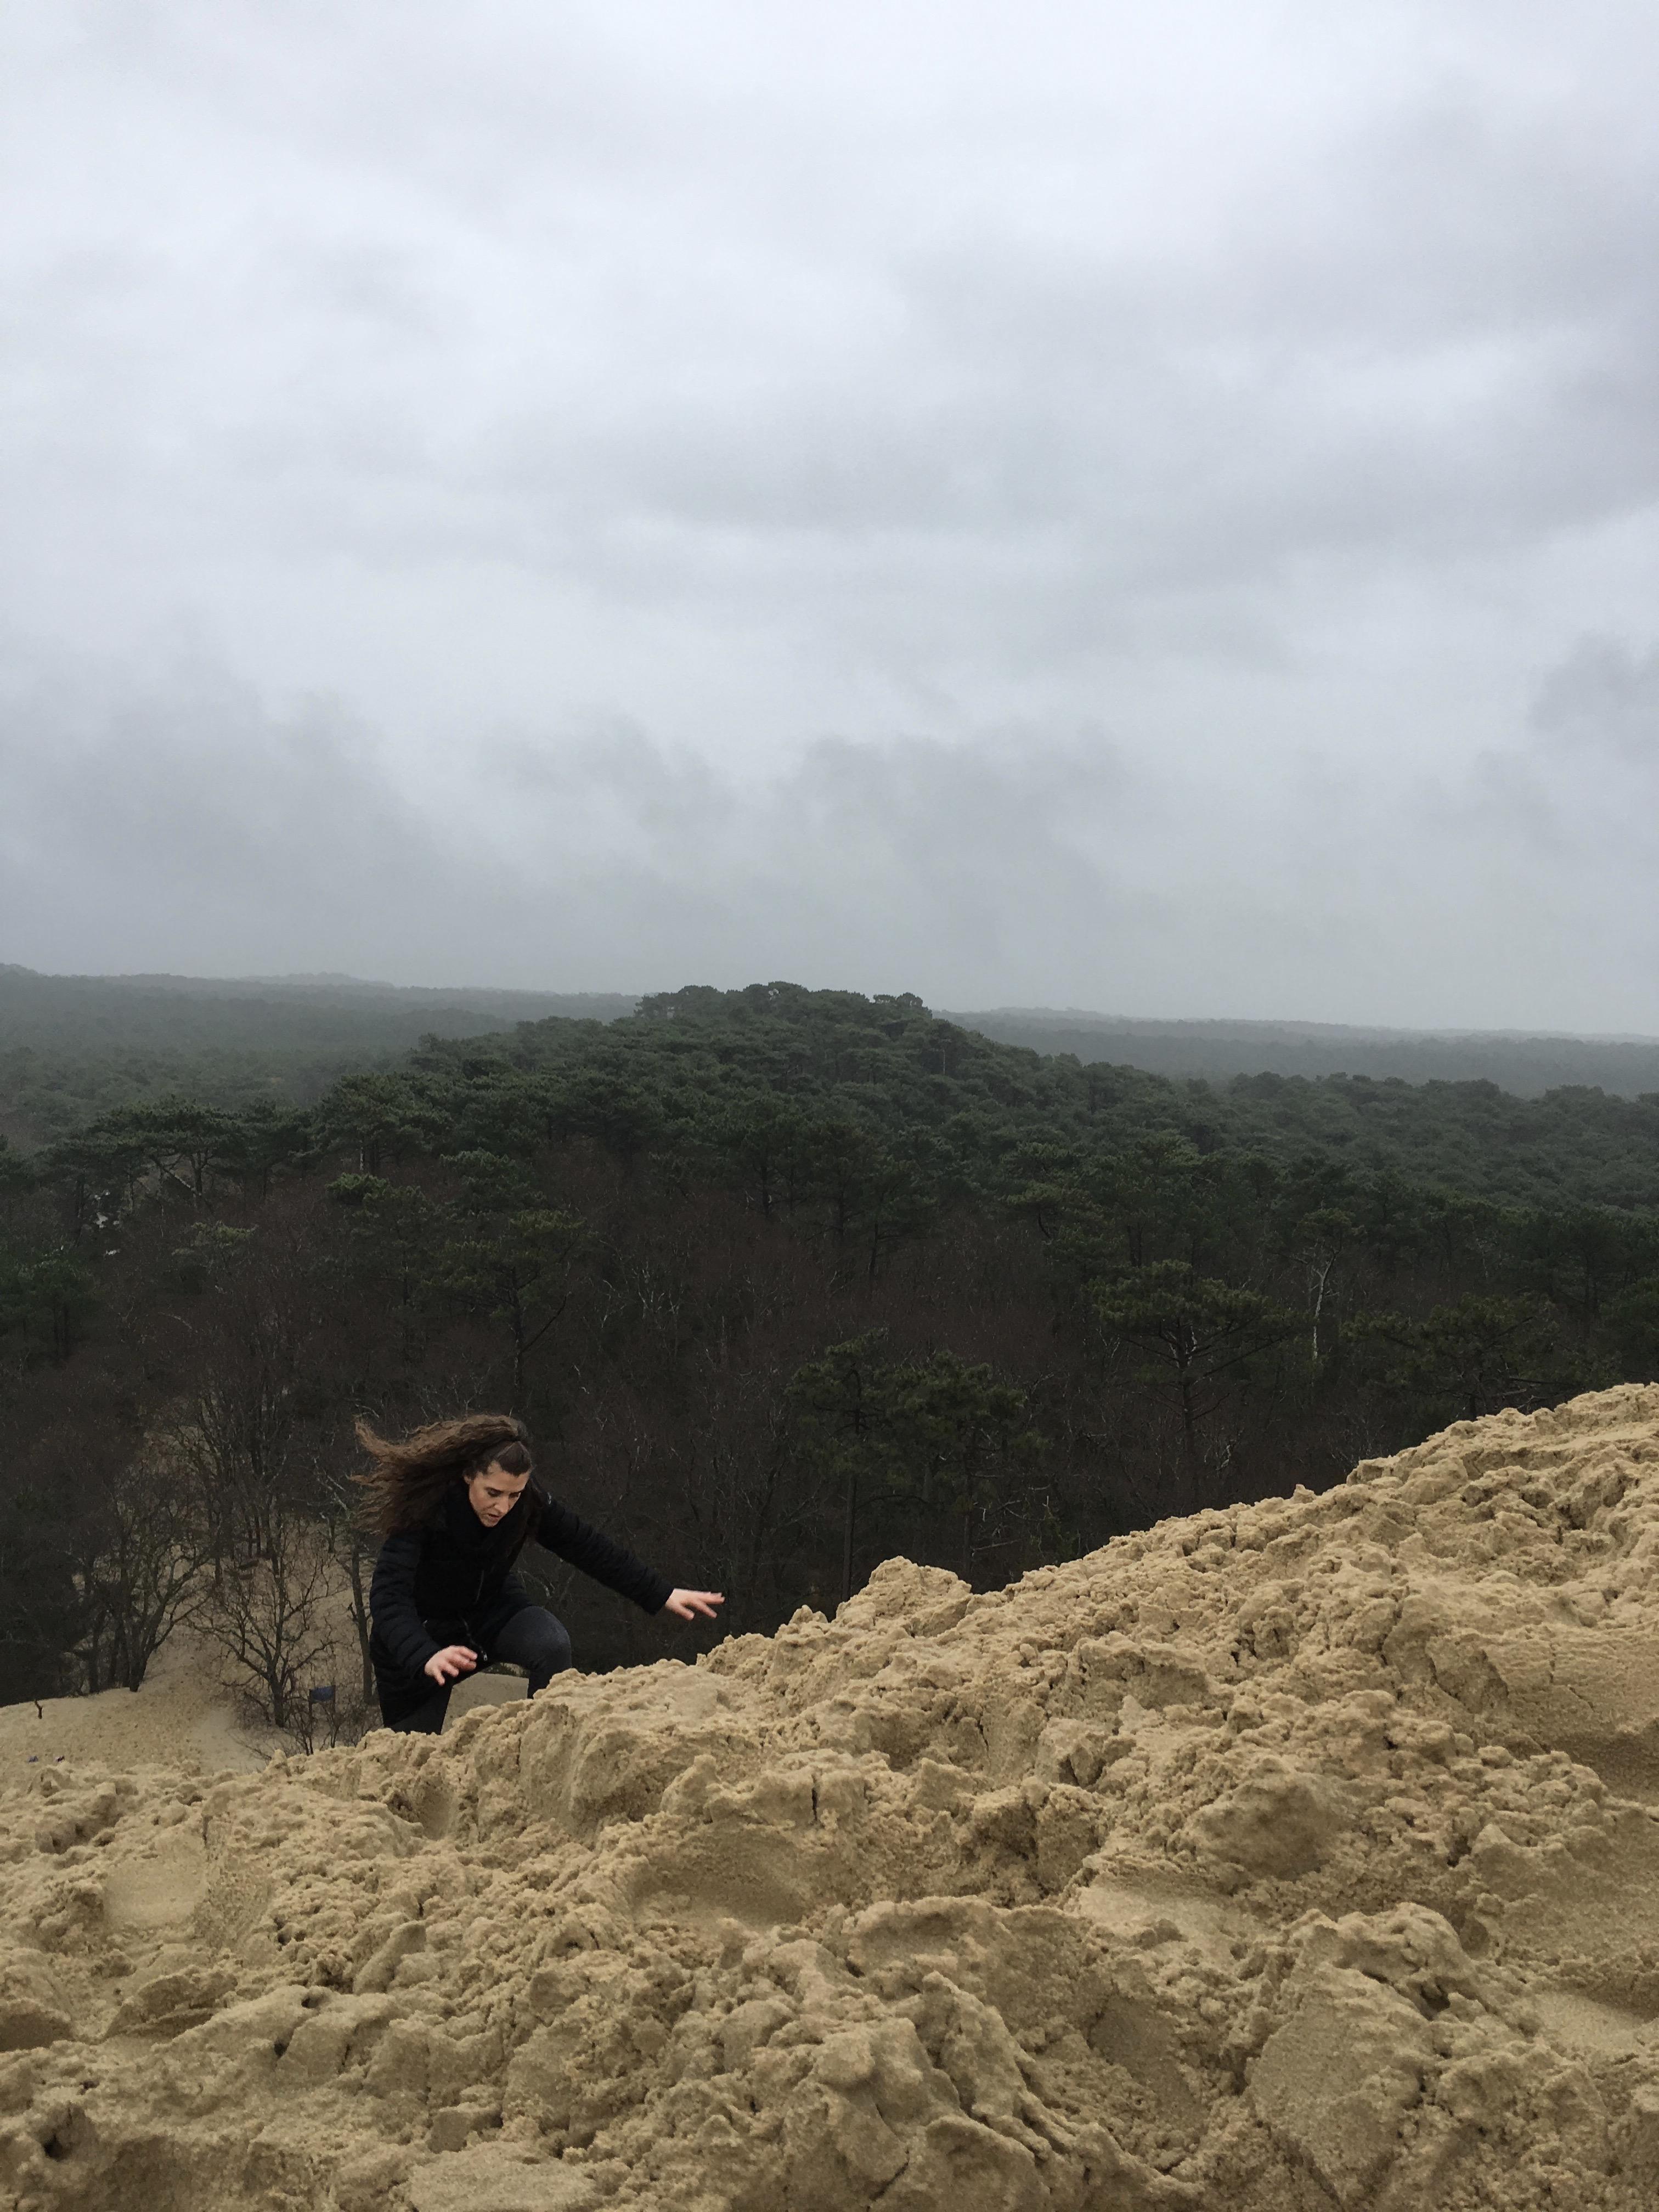 raggiungere-sommità-duna-pilat